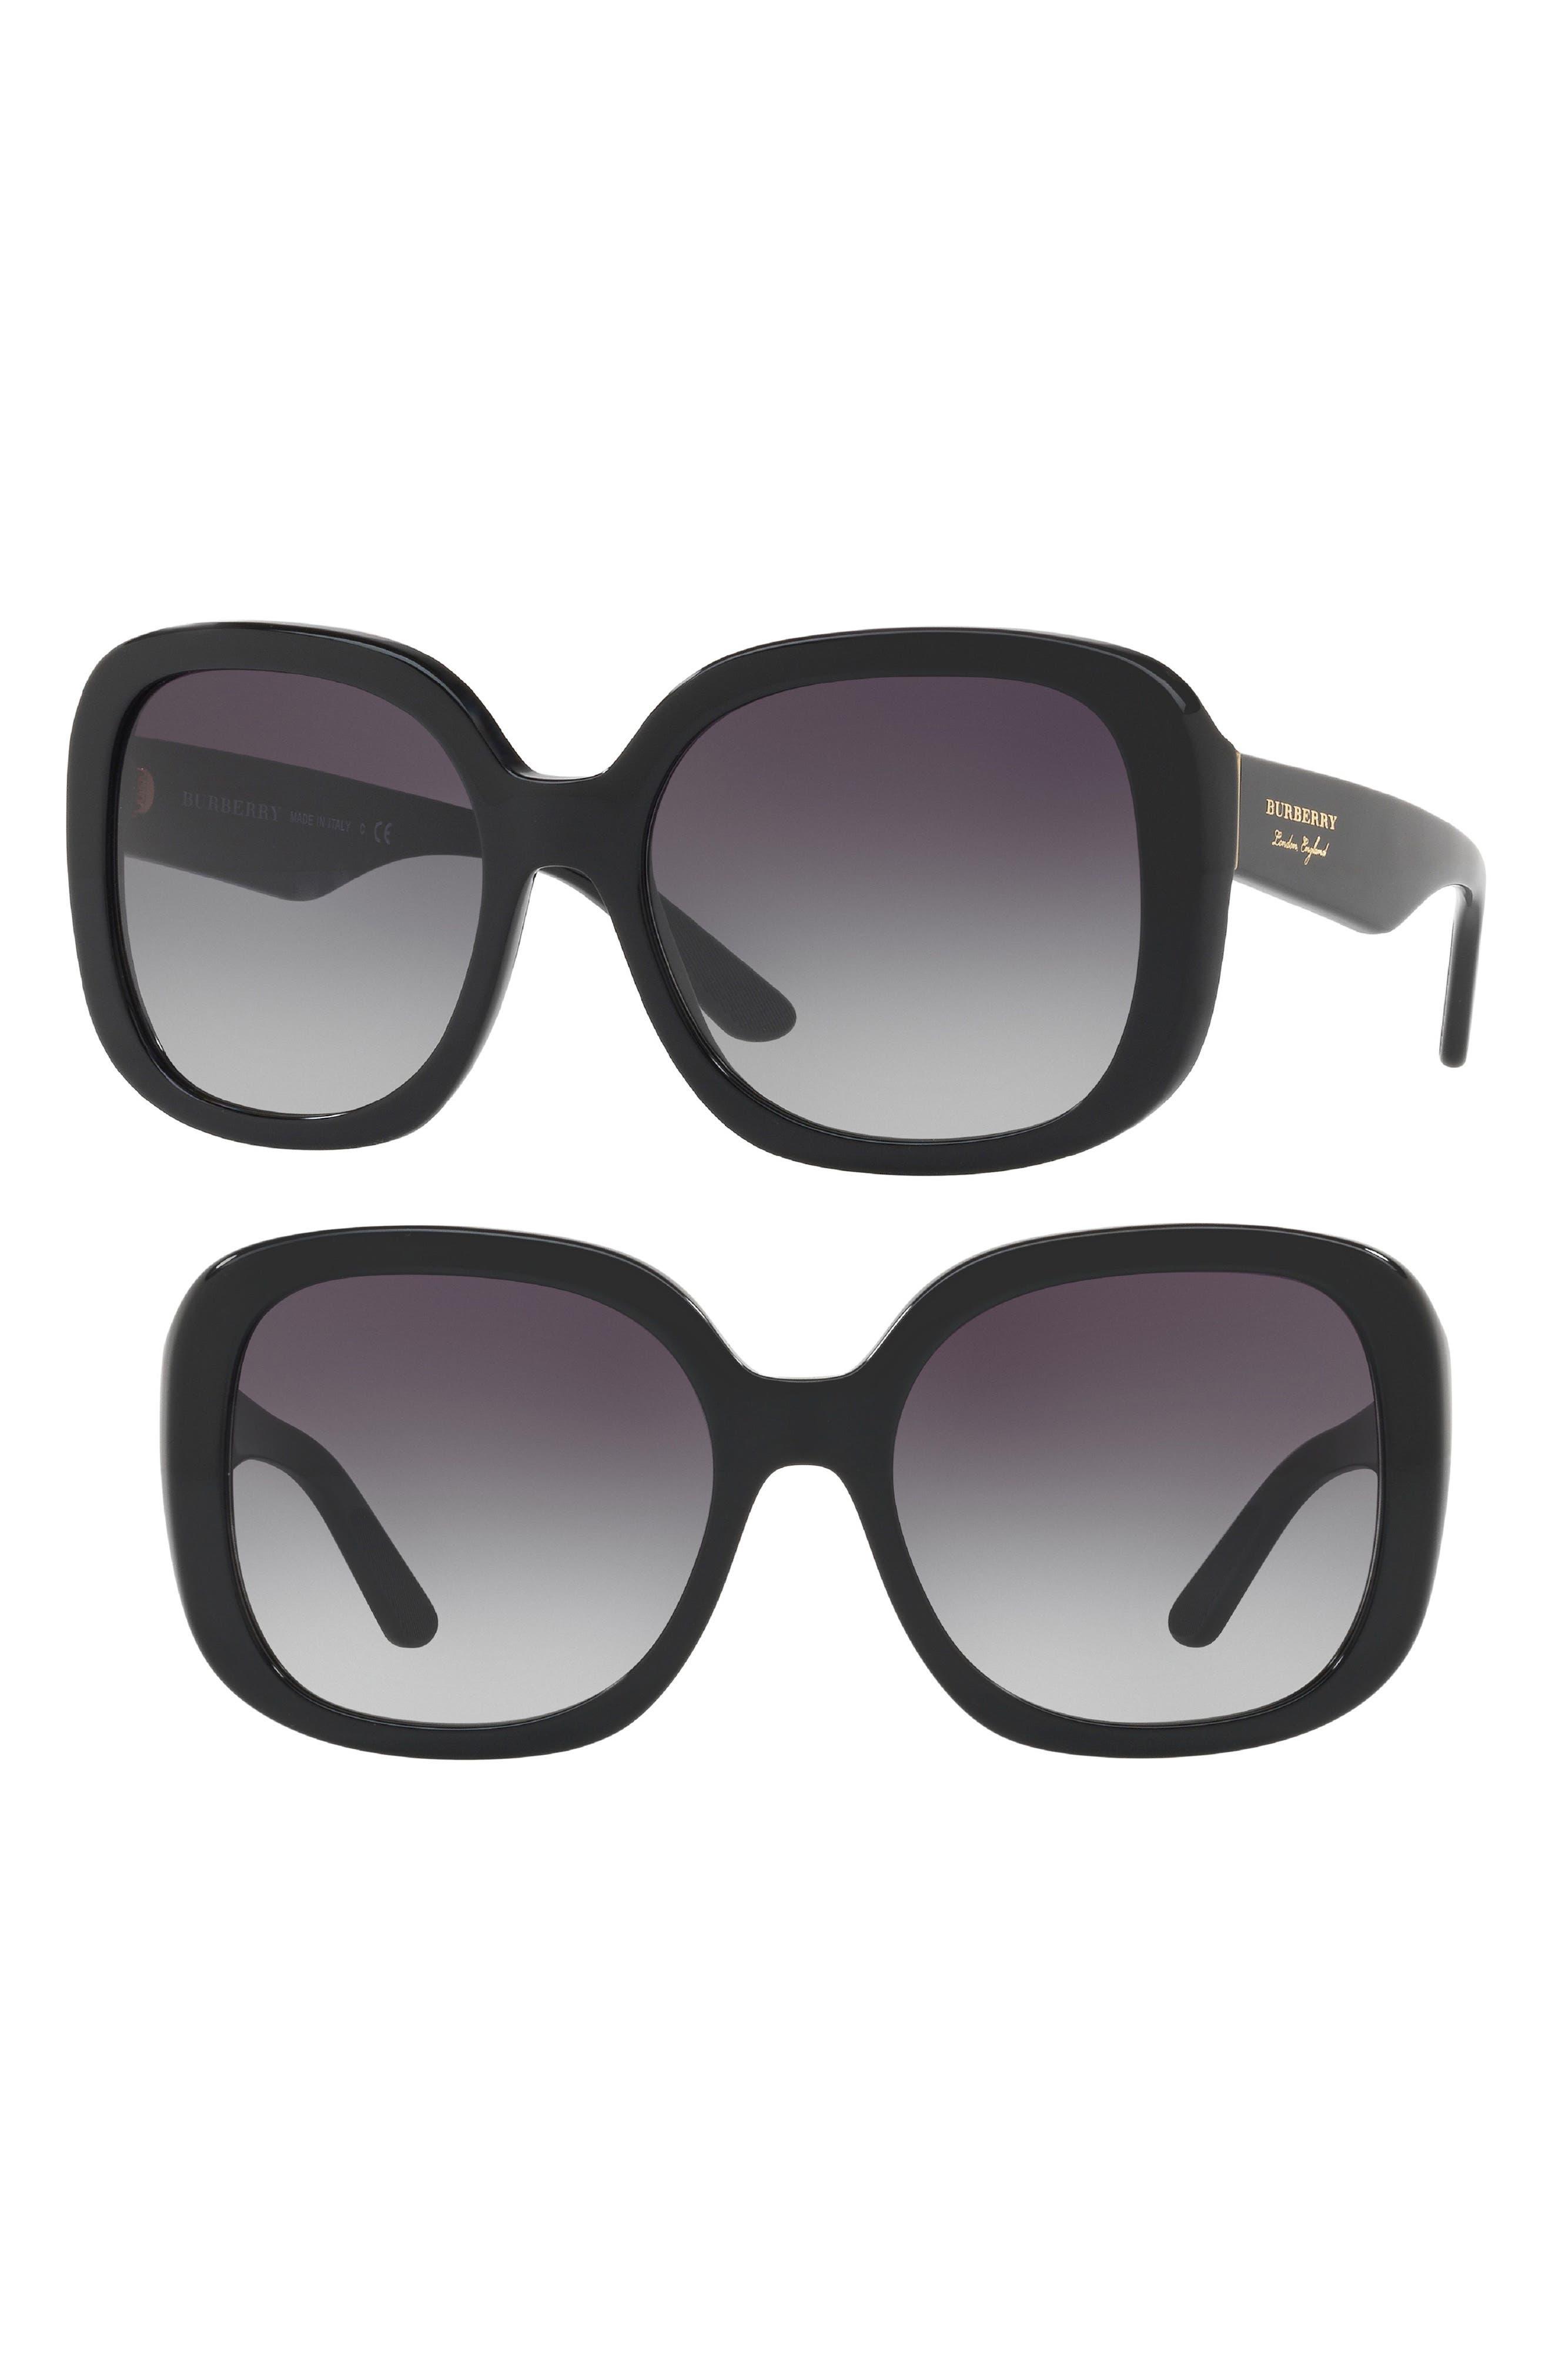 56mm Gradient Sunglasses,                         Main,                         color, 001